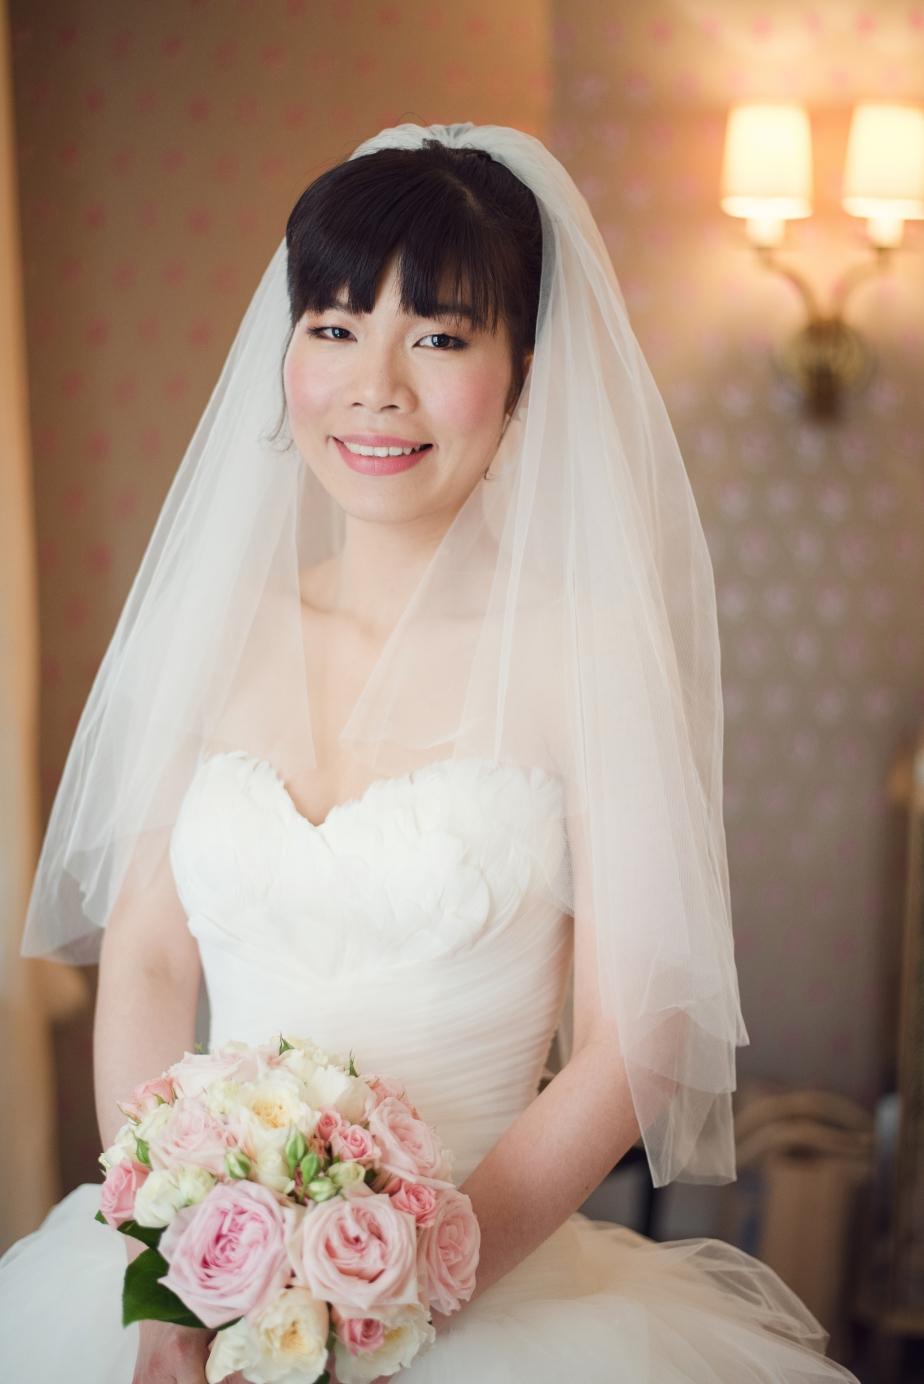 hanyi-chen-bride.jpg